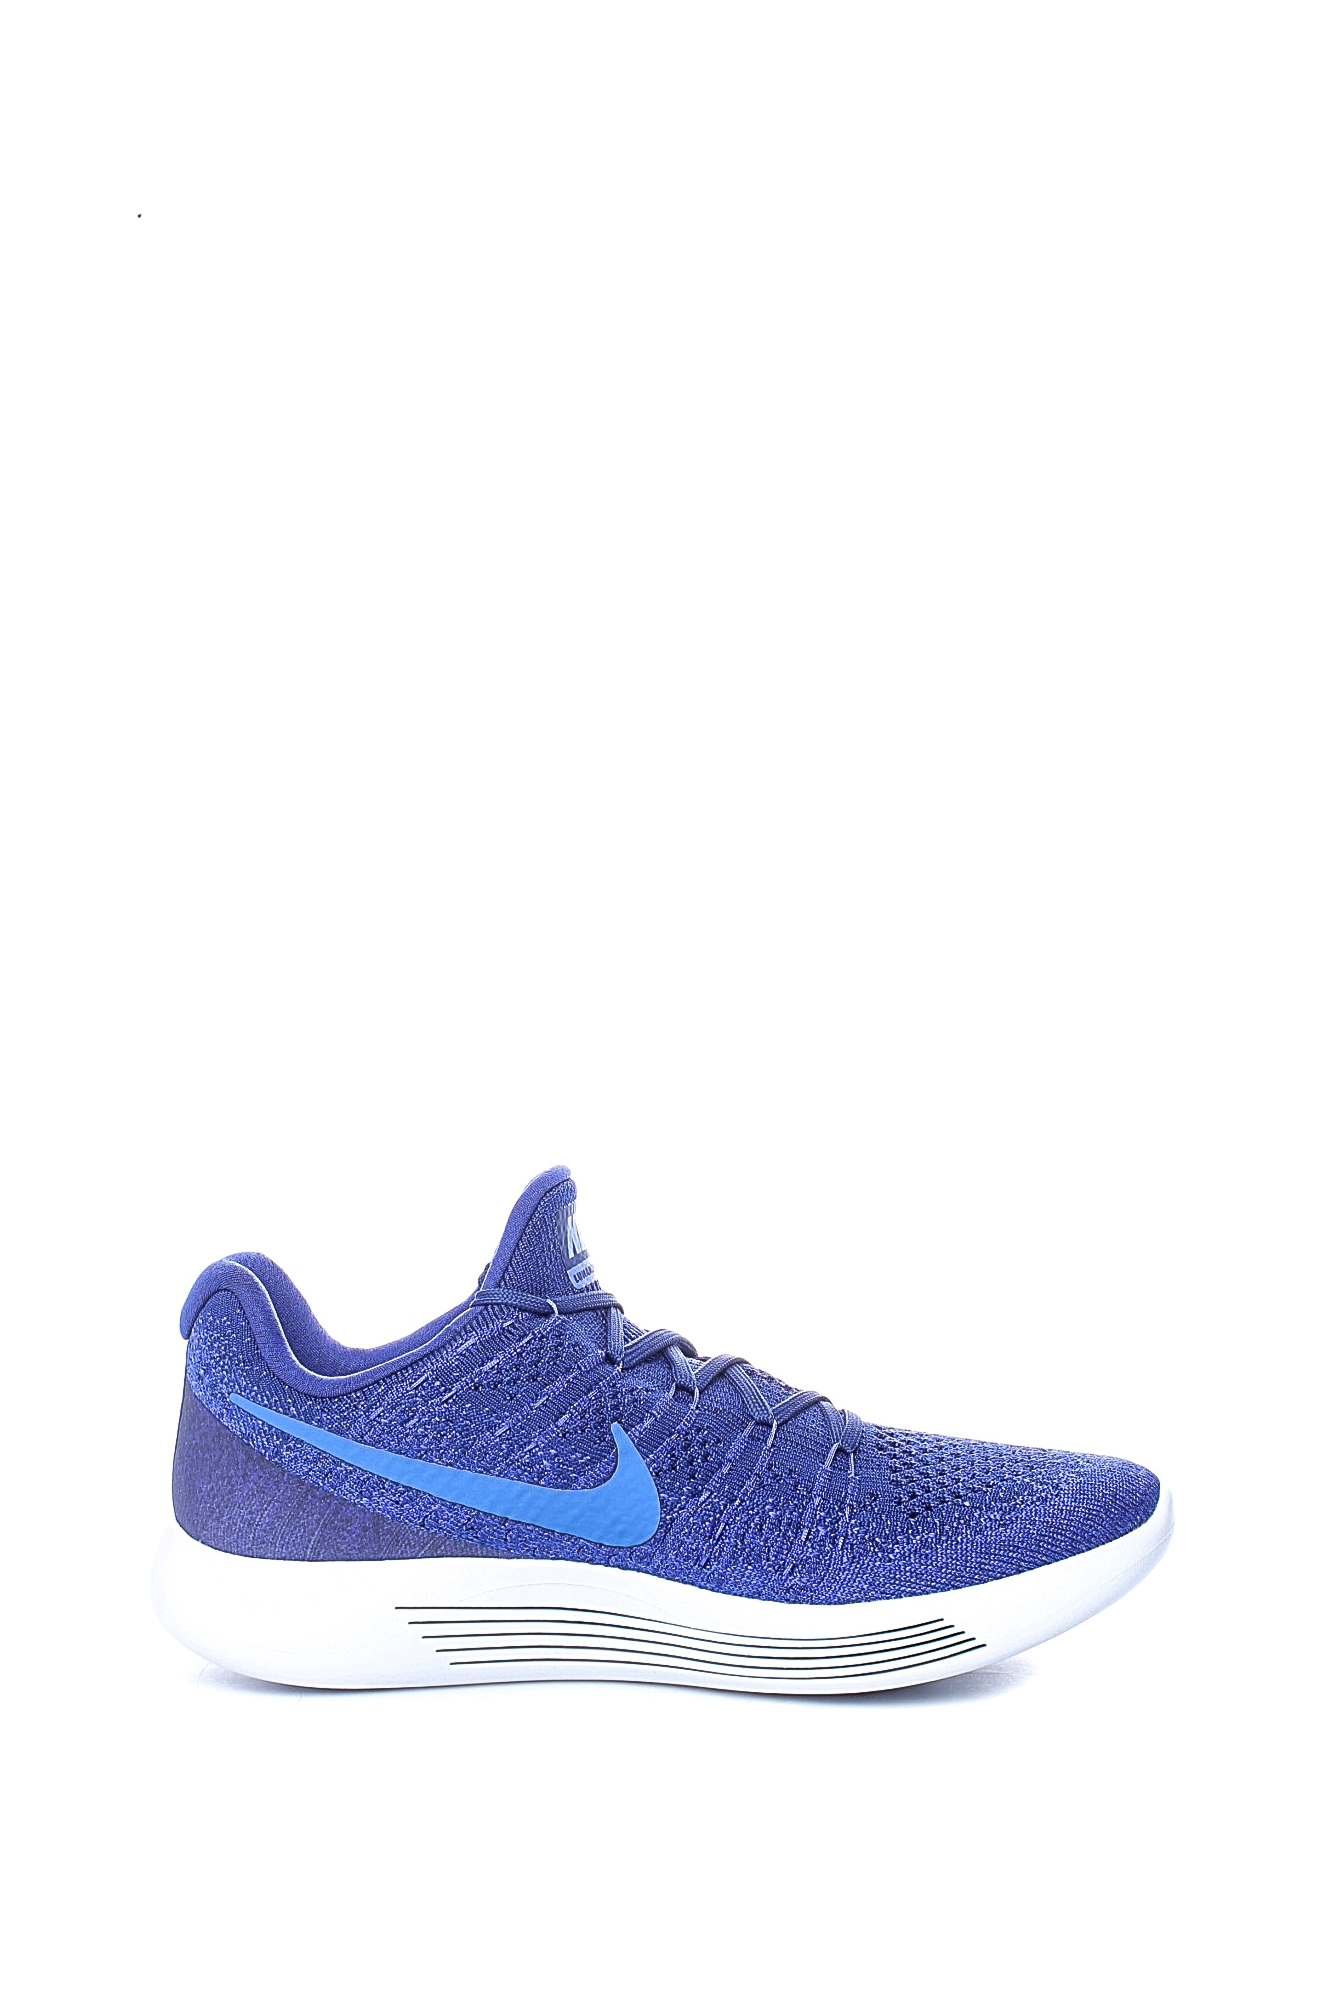 NIKE – Ανδρικά αθλητικά παπούτσια Nike LUNAREPIC LOW FLYKNIT 2 μπλε